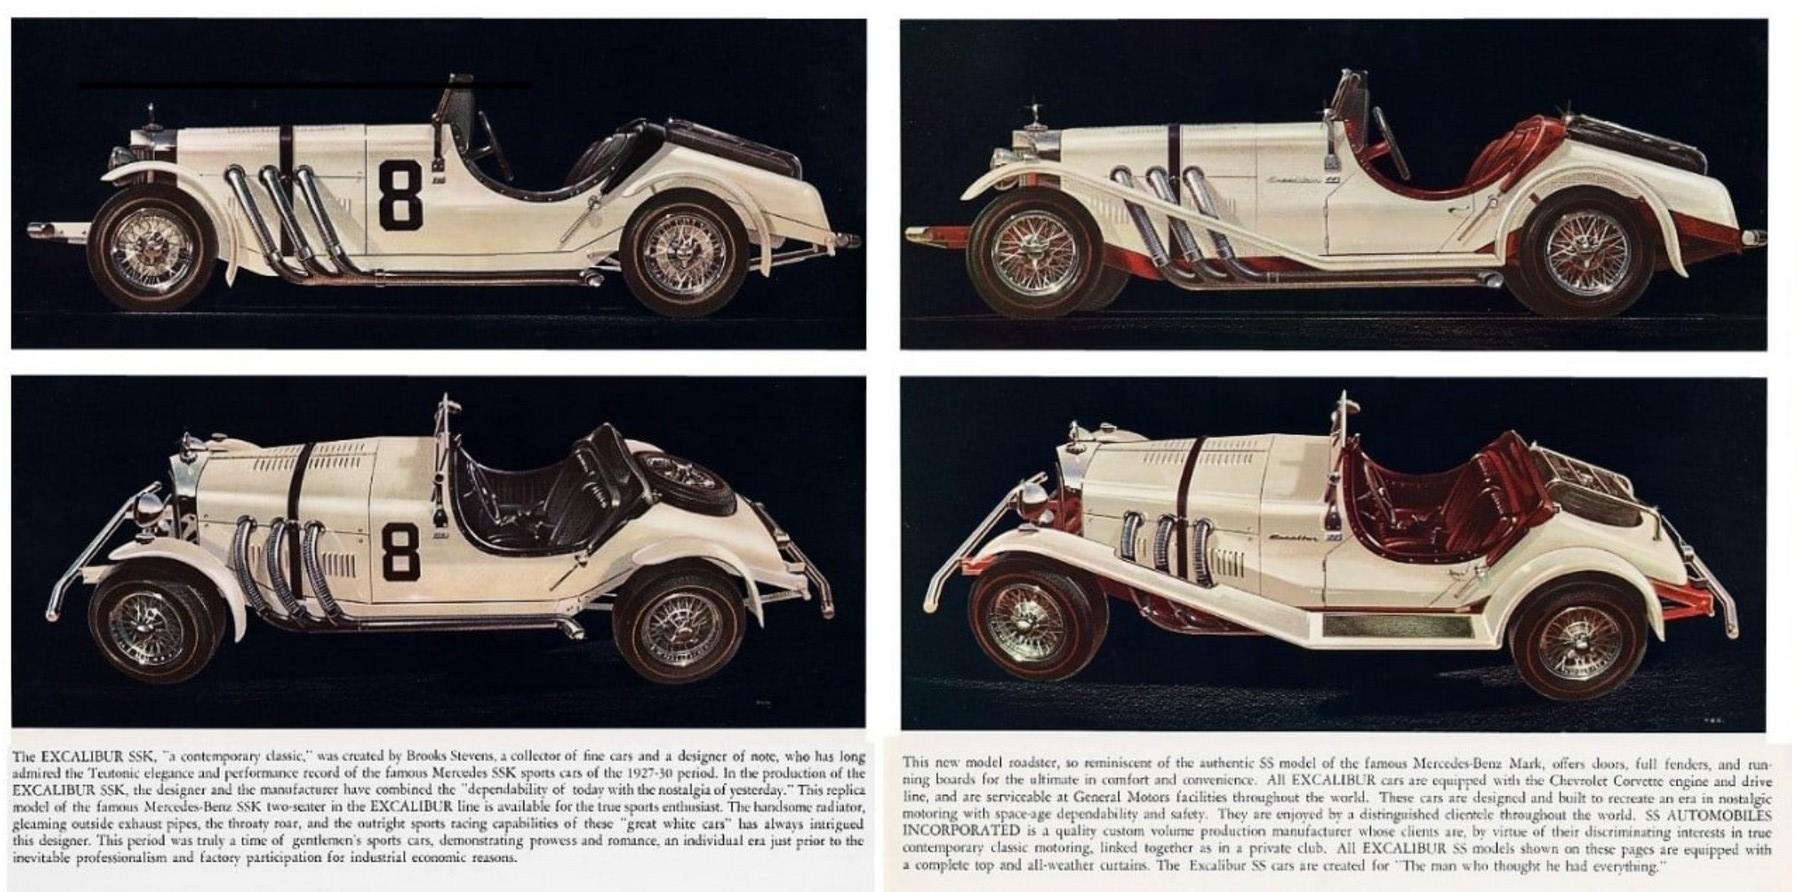 EXCALIBUR SSK 100 DE JOHNNY HALLYDAY ( 1966 ) Story_11